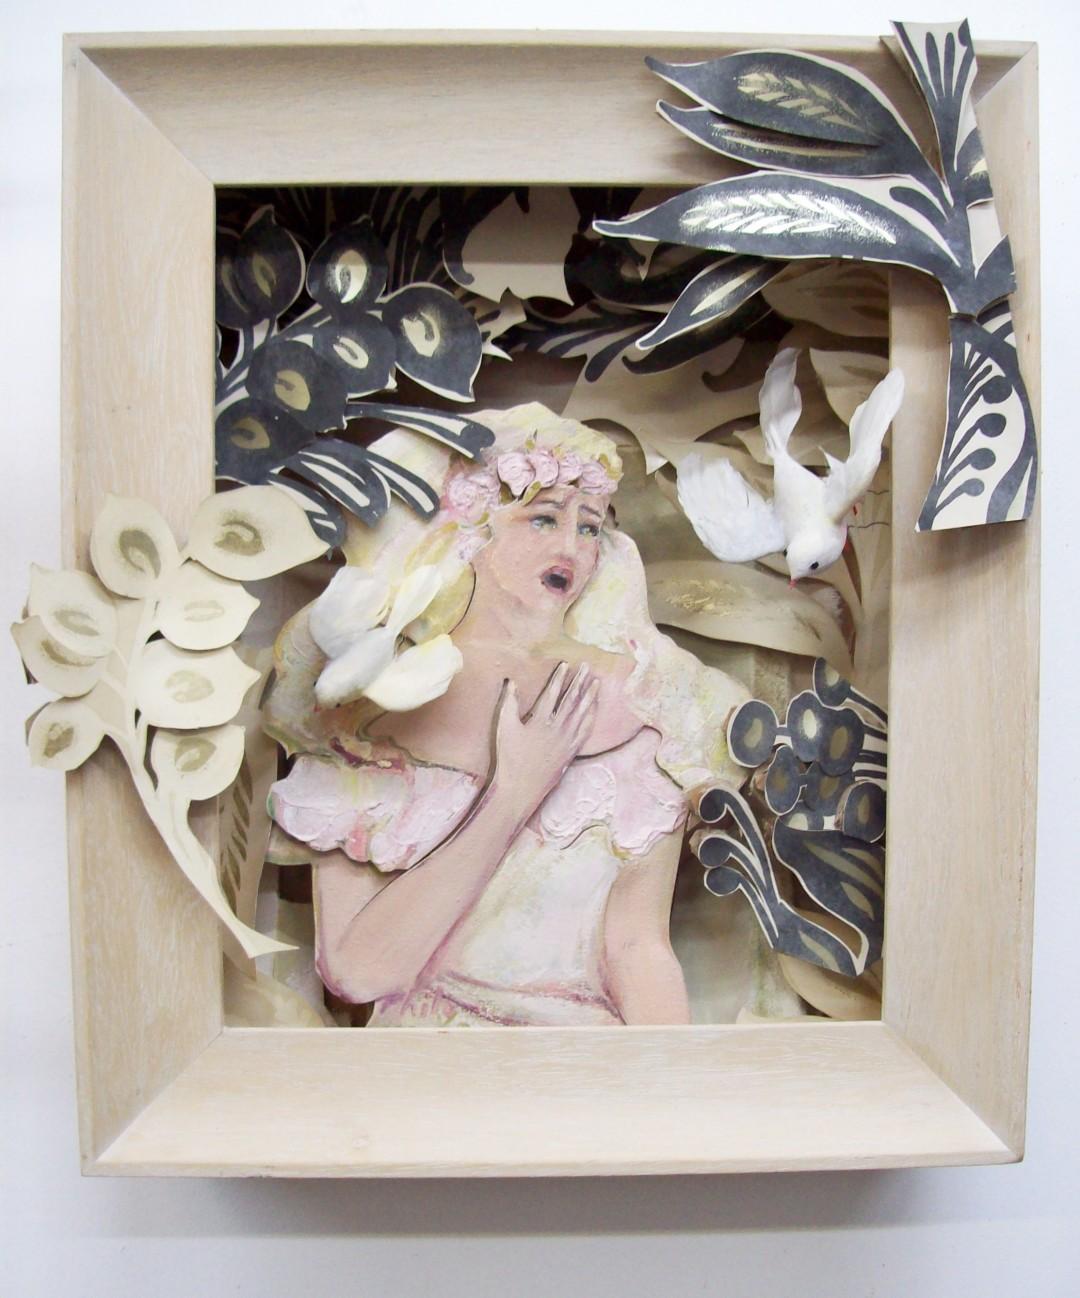 image of original artwork, Balding Bride by Philomena Harmsworth